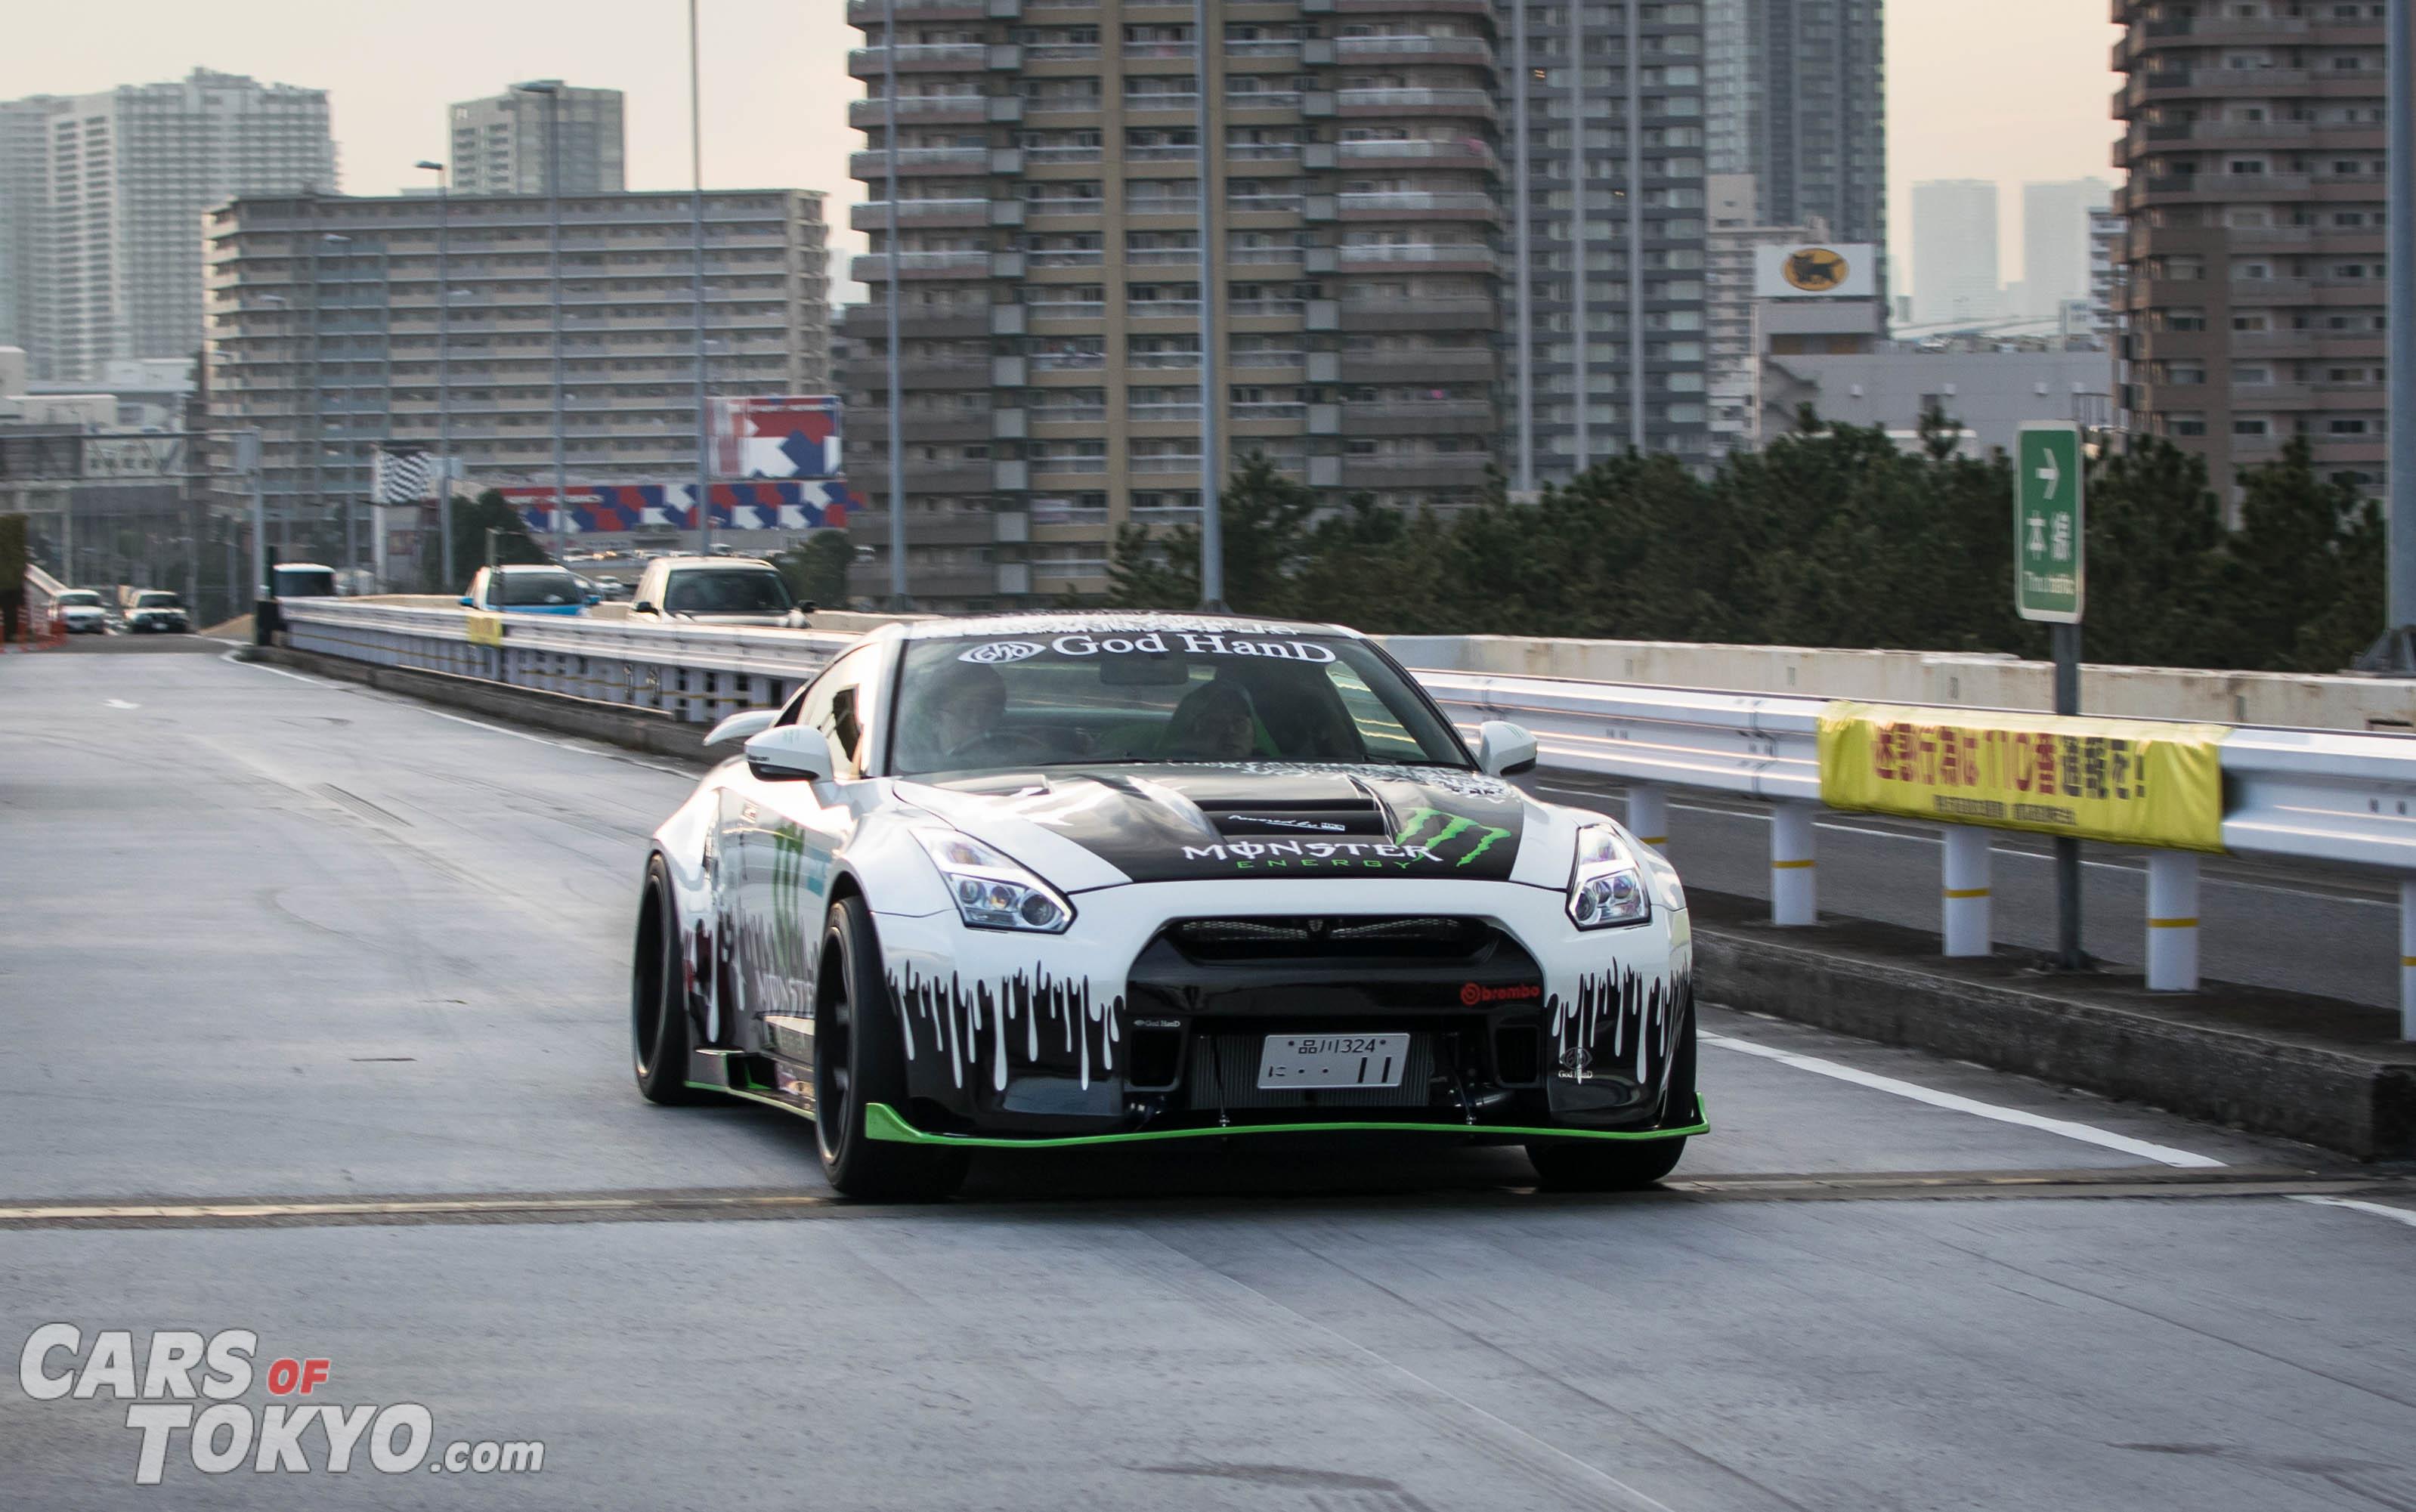 Cars of Tokyo Tatsumi Nissan GT-R Monster